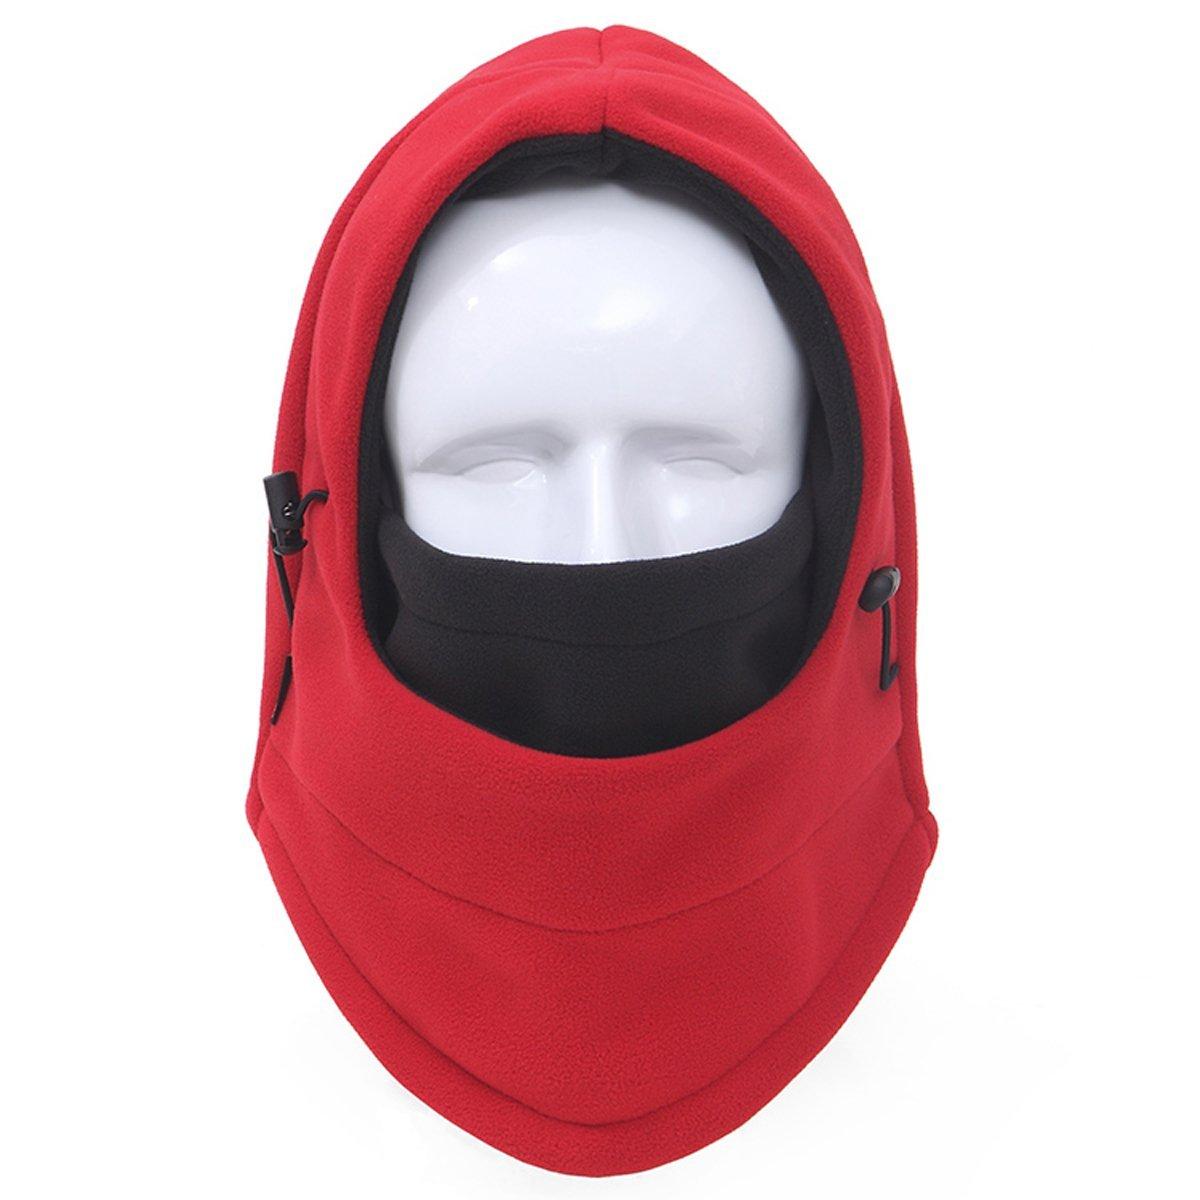 cf761e3a39e 6 in 1 Double Layers Thermal Ski Face Mask WalkingMan Motorcycle Fleece  Balaclava Windproof Hooded Neck